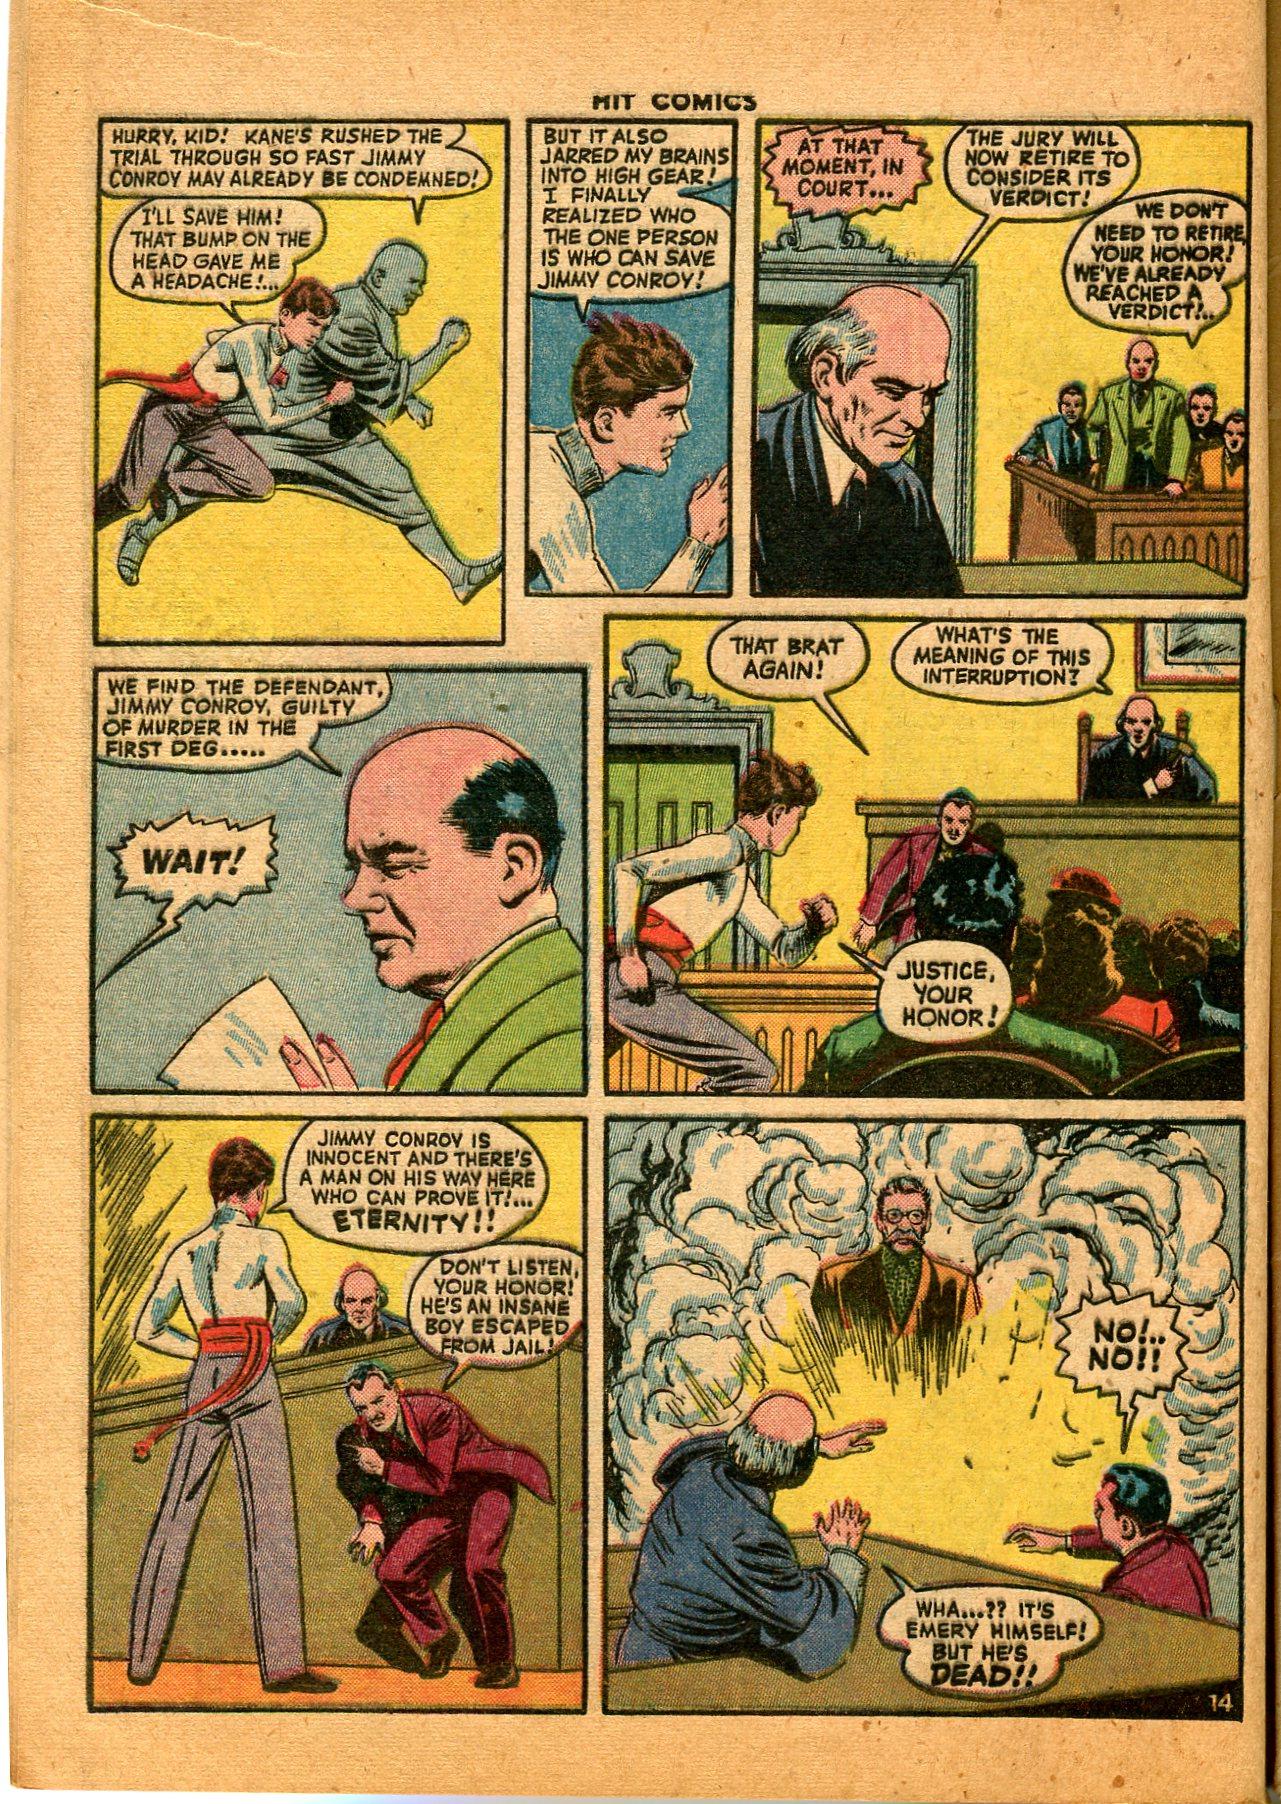 Read online Hit Comics comic -  Issue #35 - 16